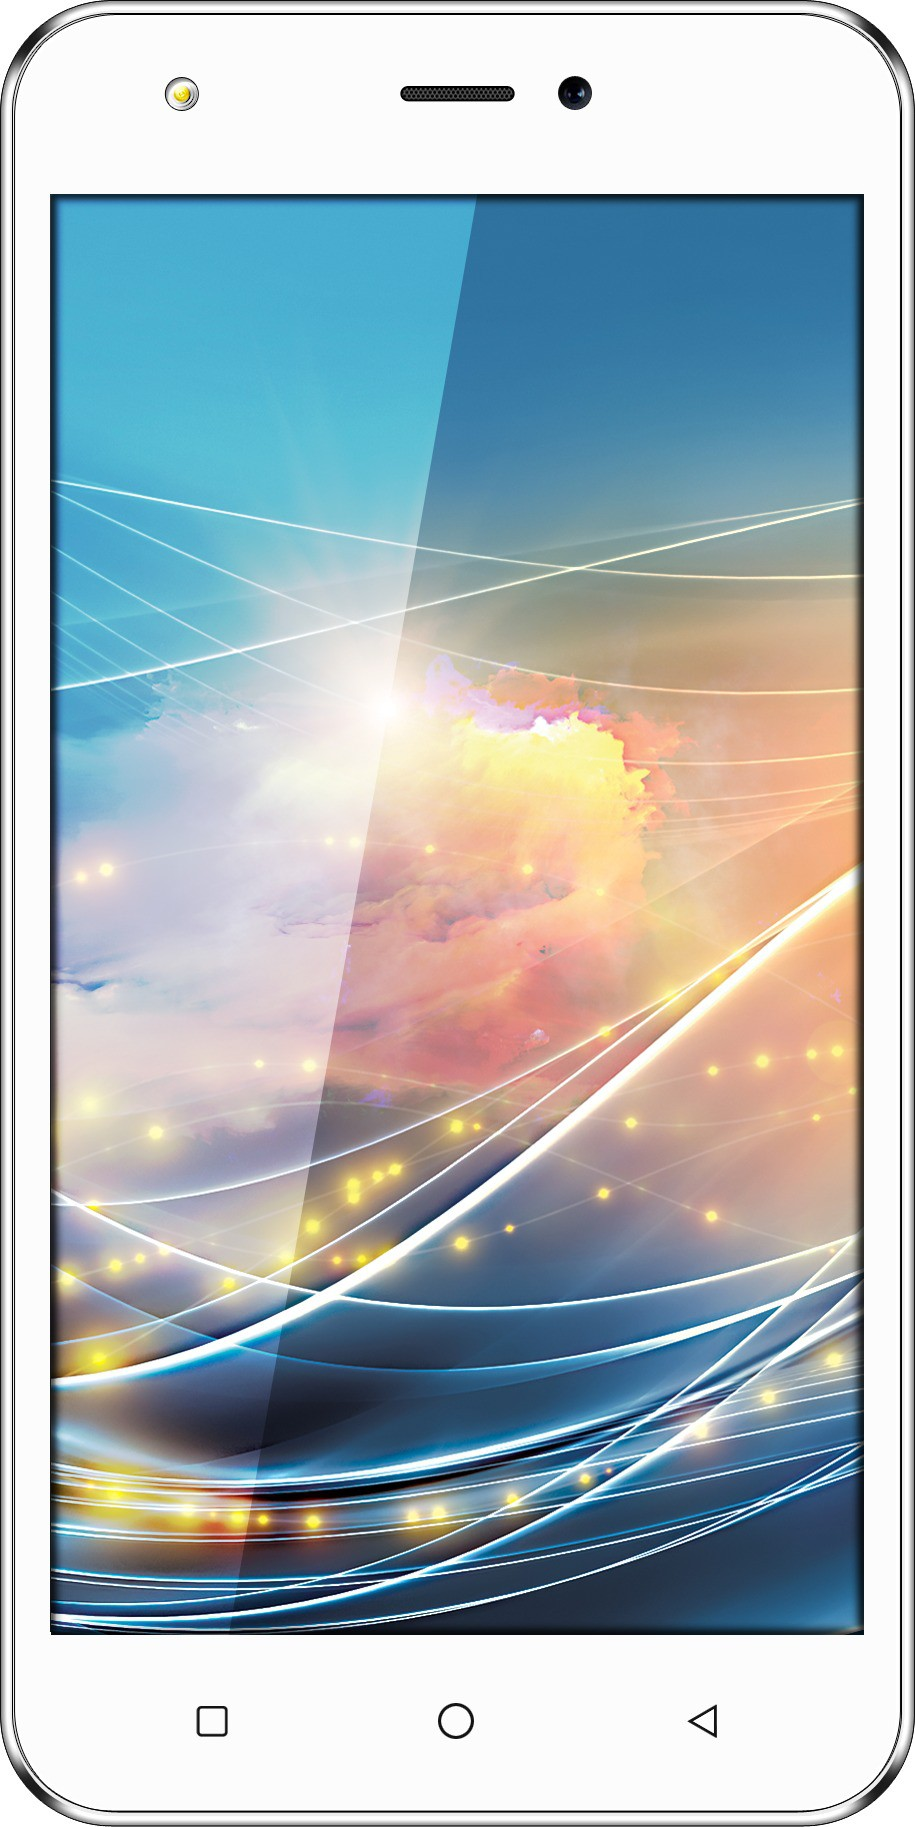 Deals - Jajpur - Intex Cloud Q11 <br> Now ₹3,999<br> Category - mobiles_and_accessories<br> Business - Flipkart.com